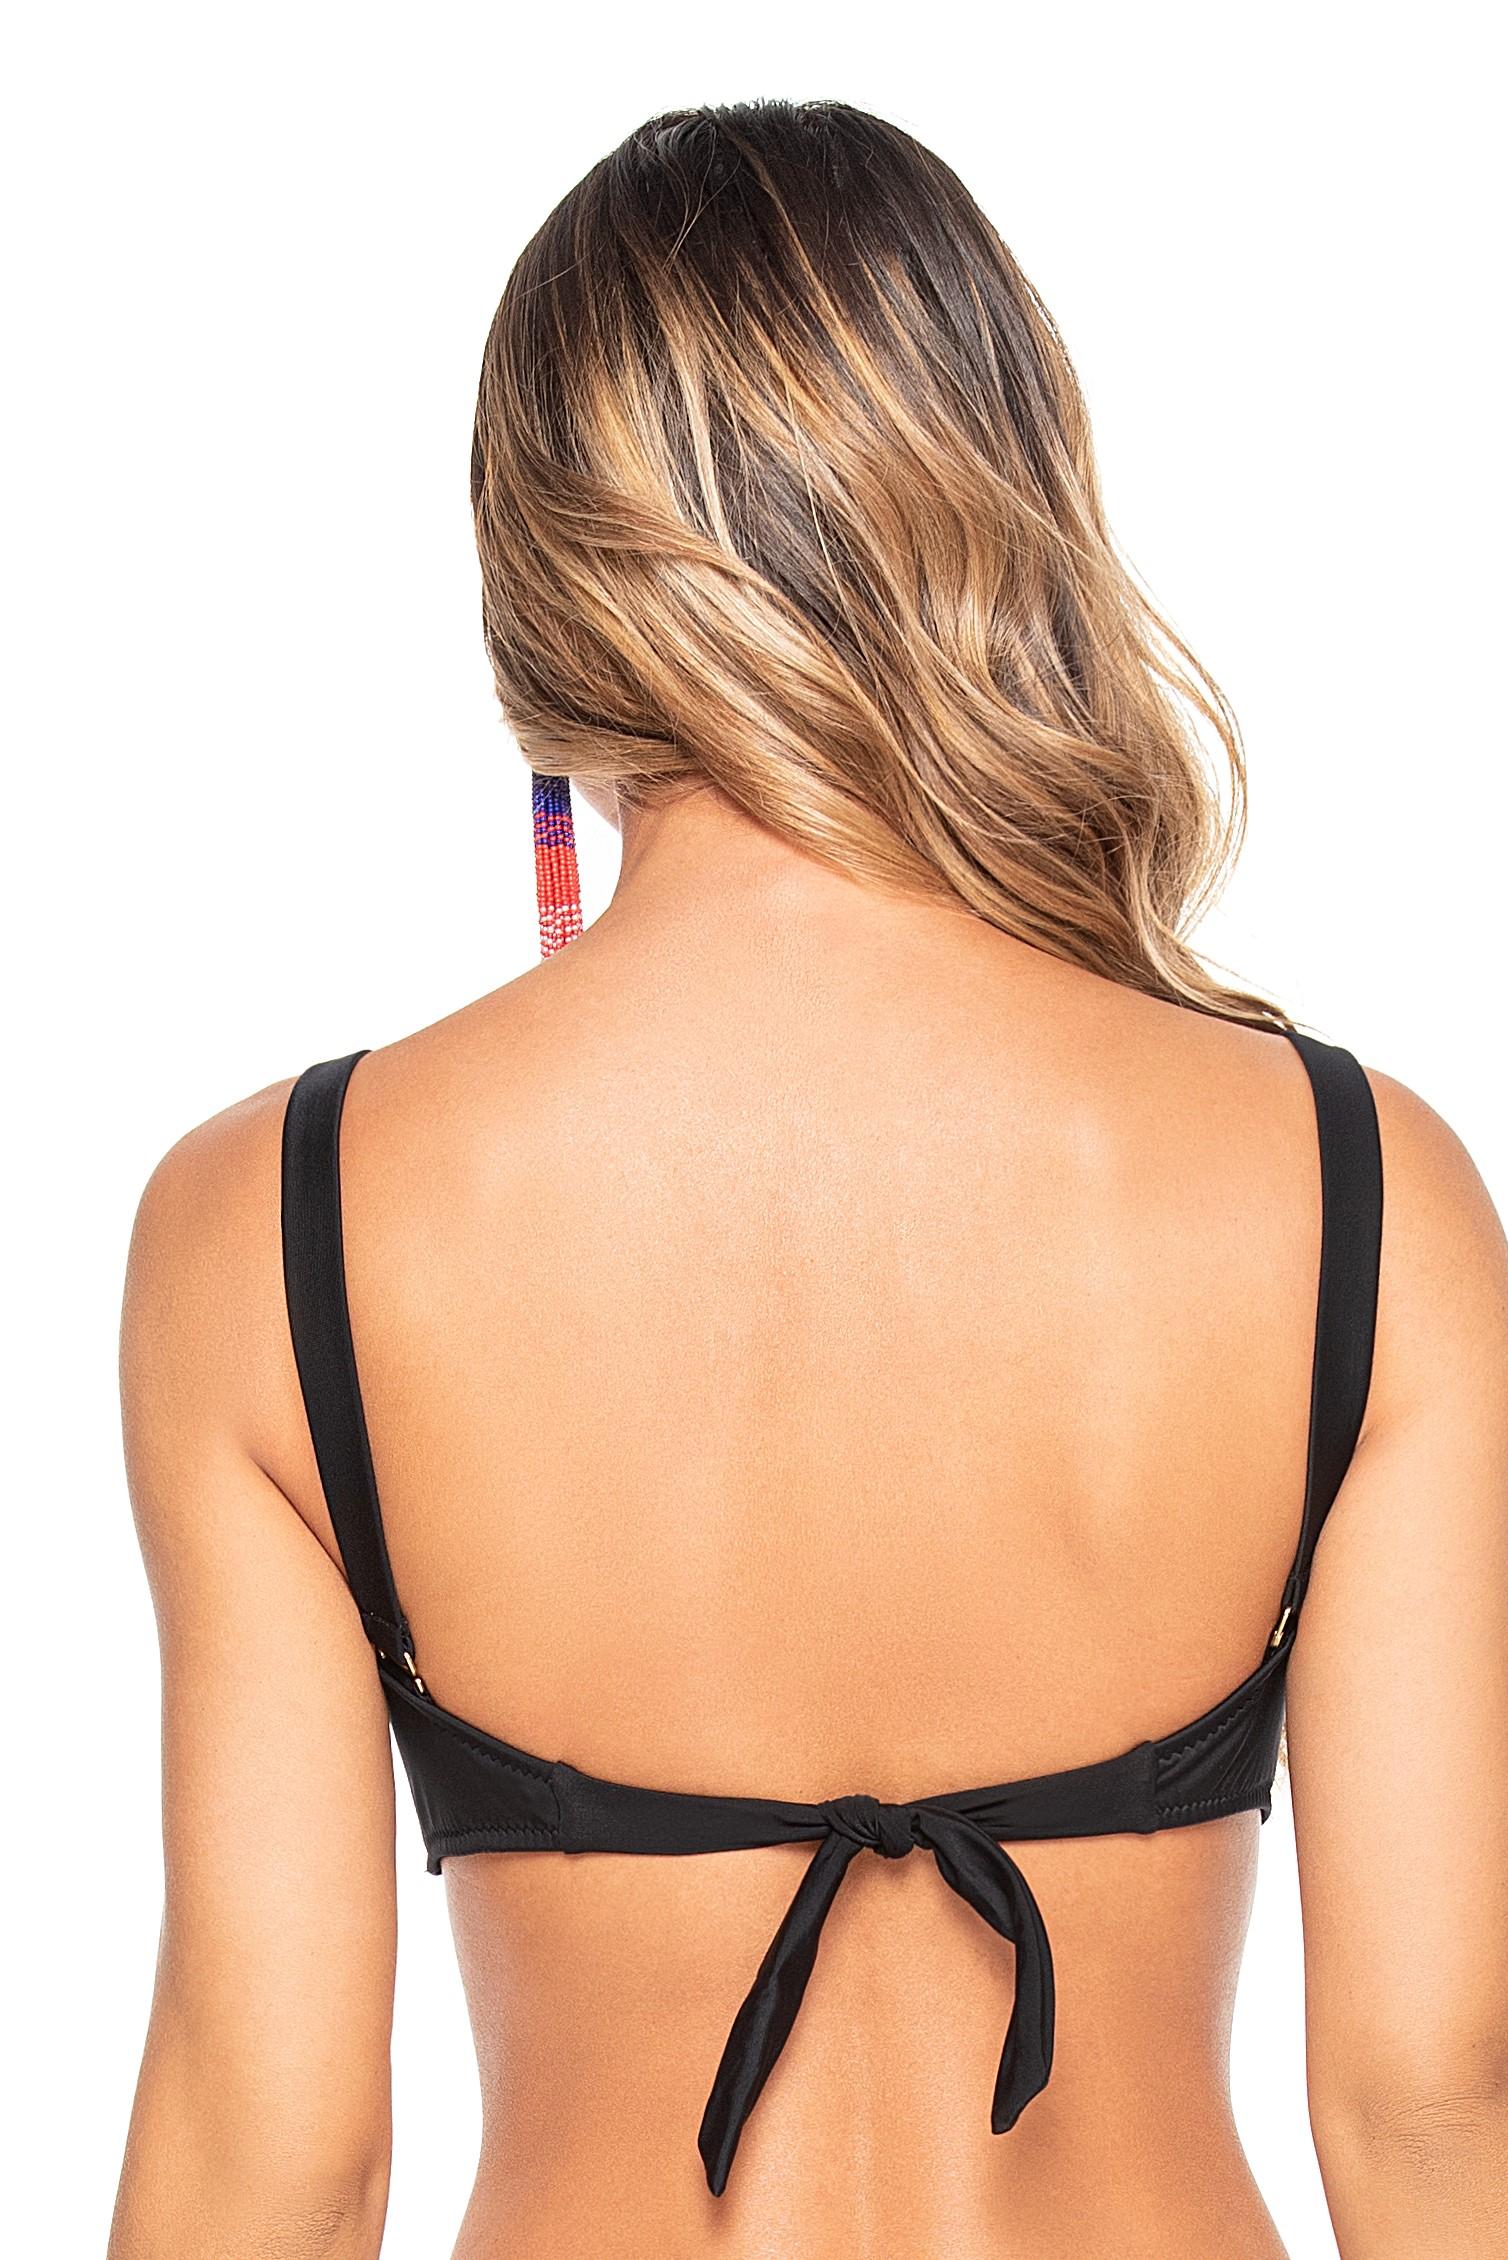 Phax Zwarte beugel bandeau bikini top